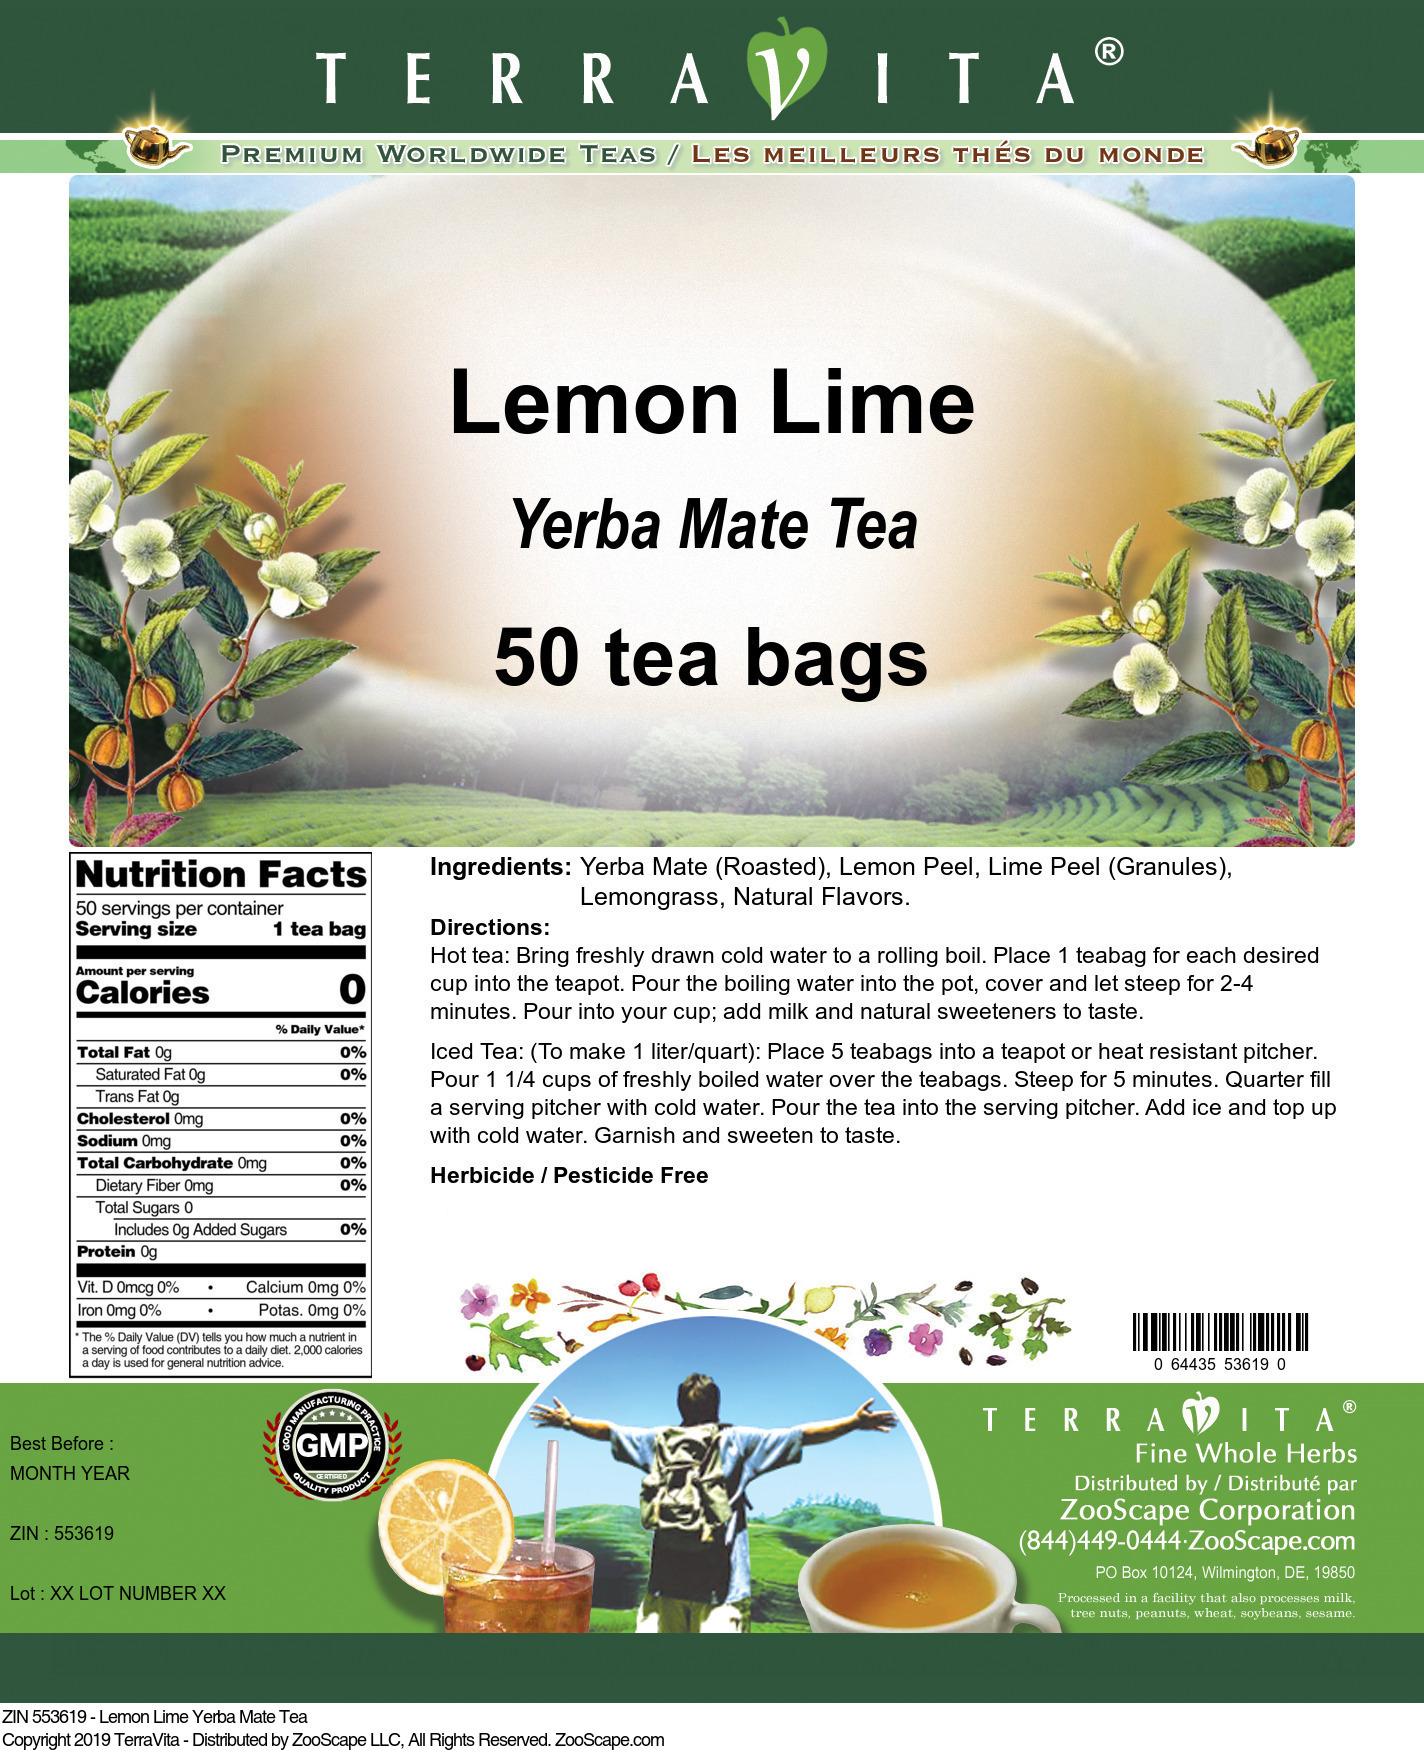 Lemon Lime Yerba Mate Tea